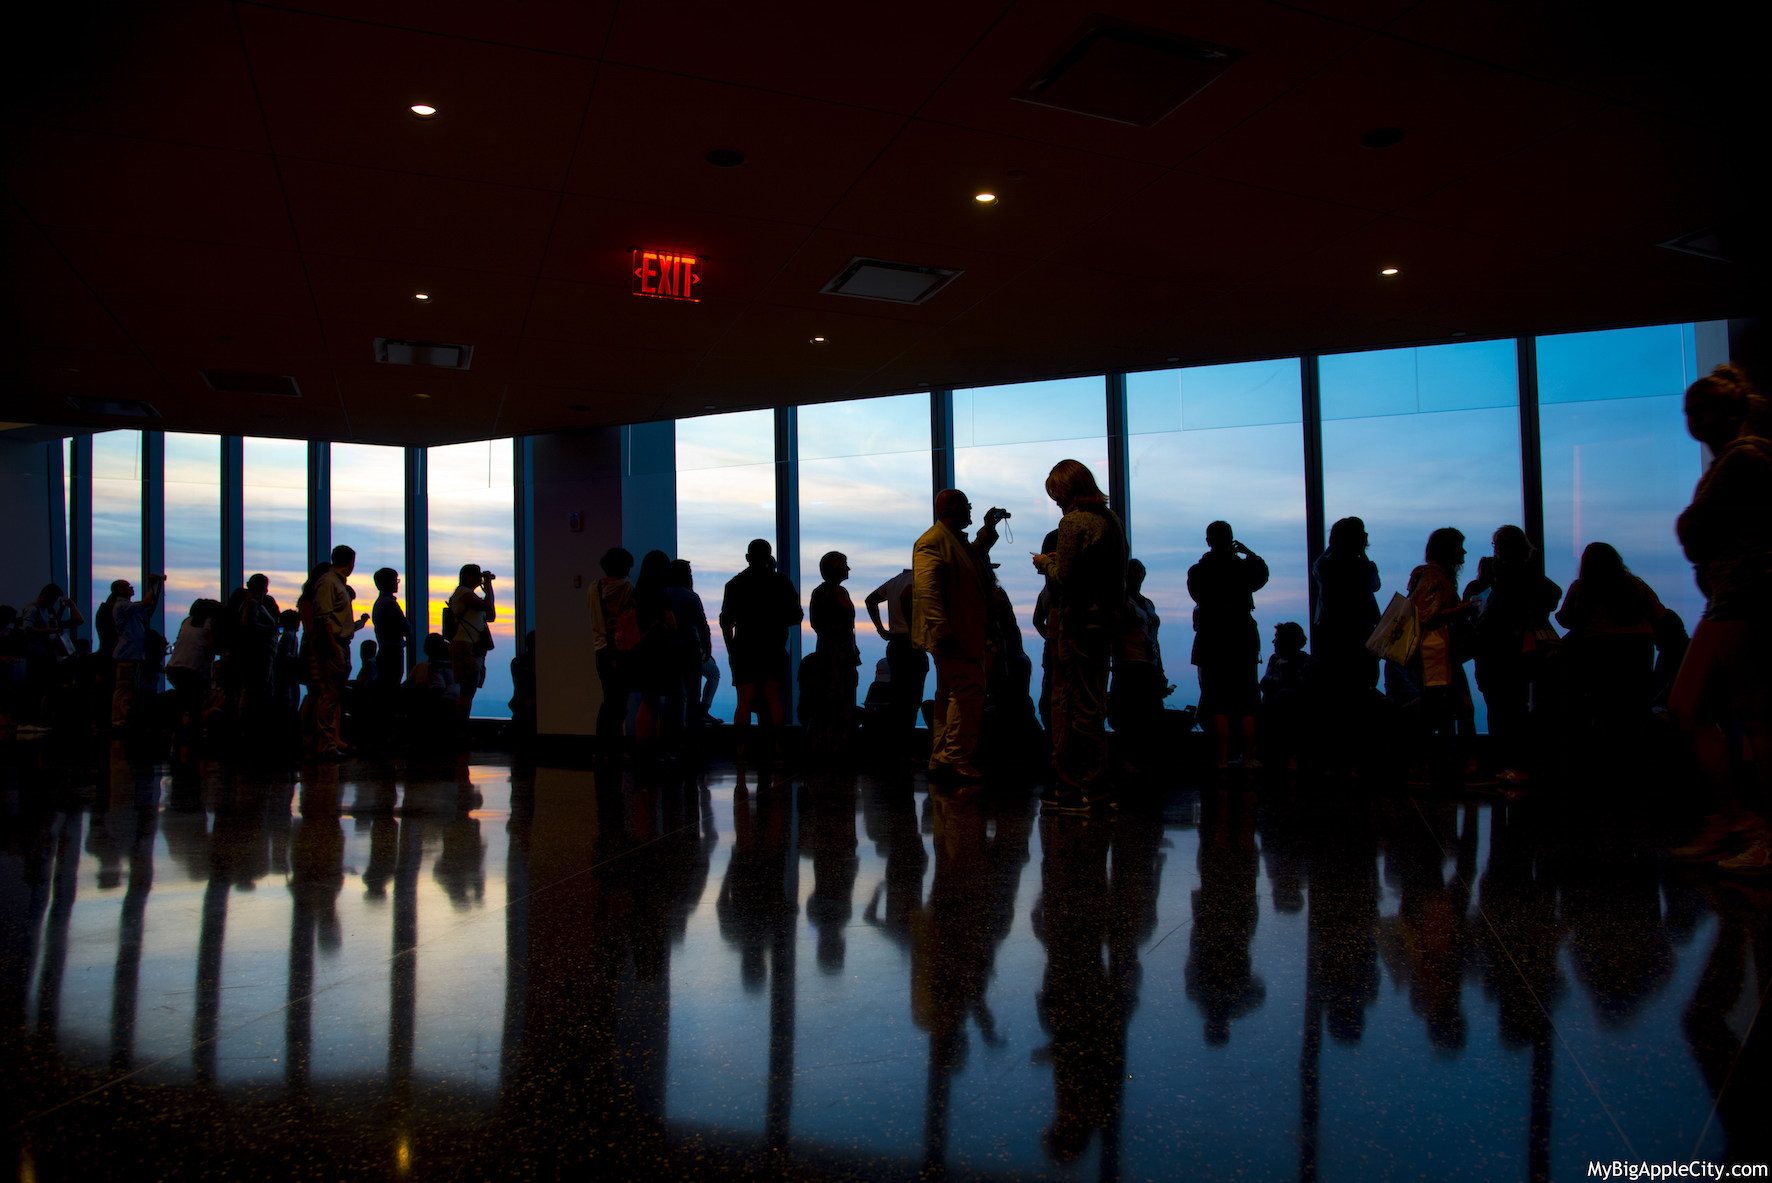 One-WTC-sunset-New-York-MyBigAppleCity